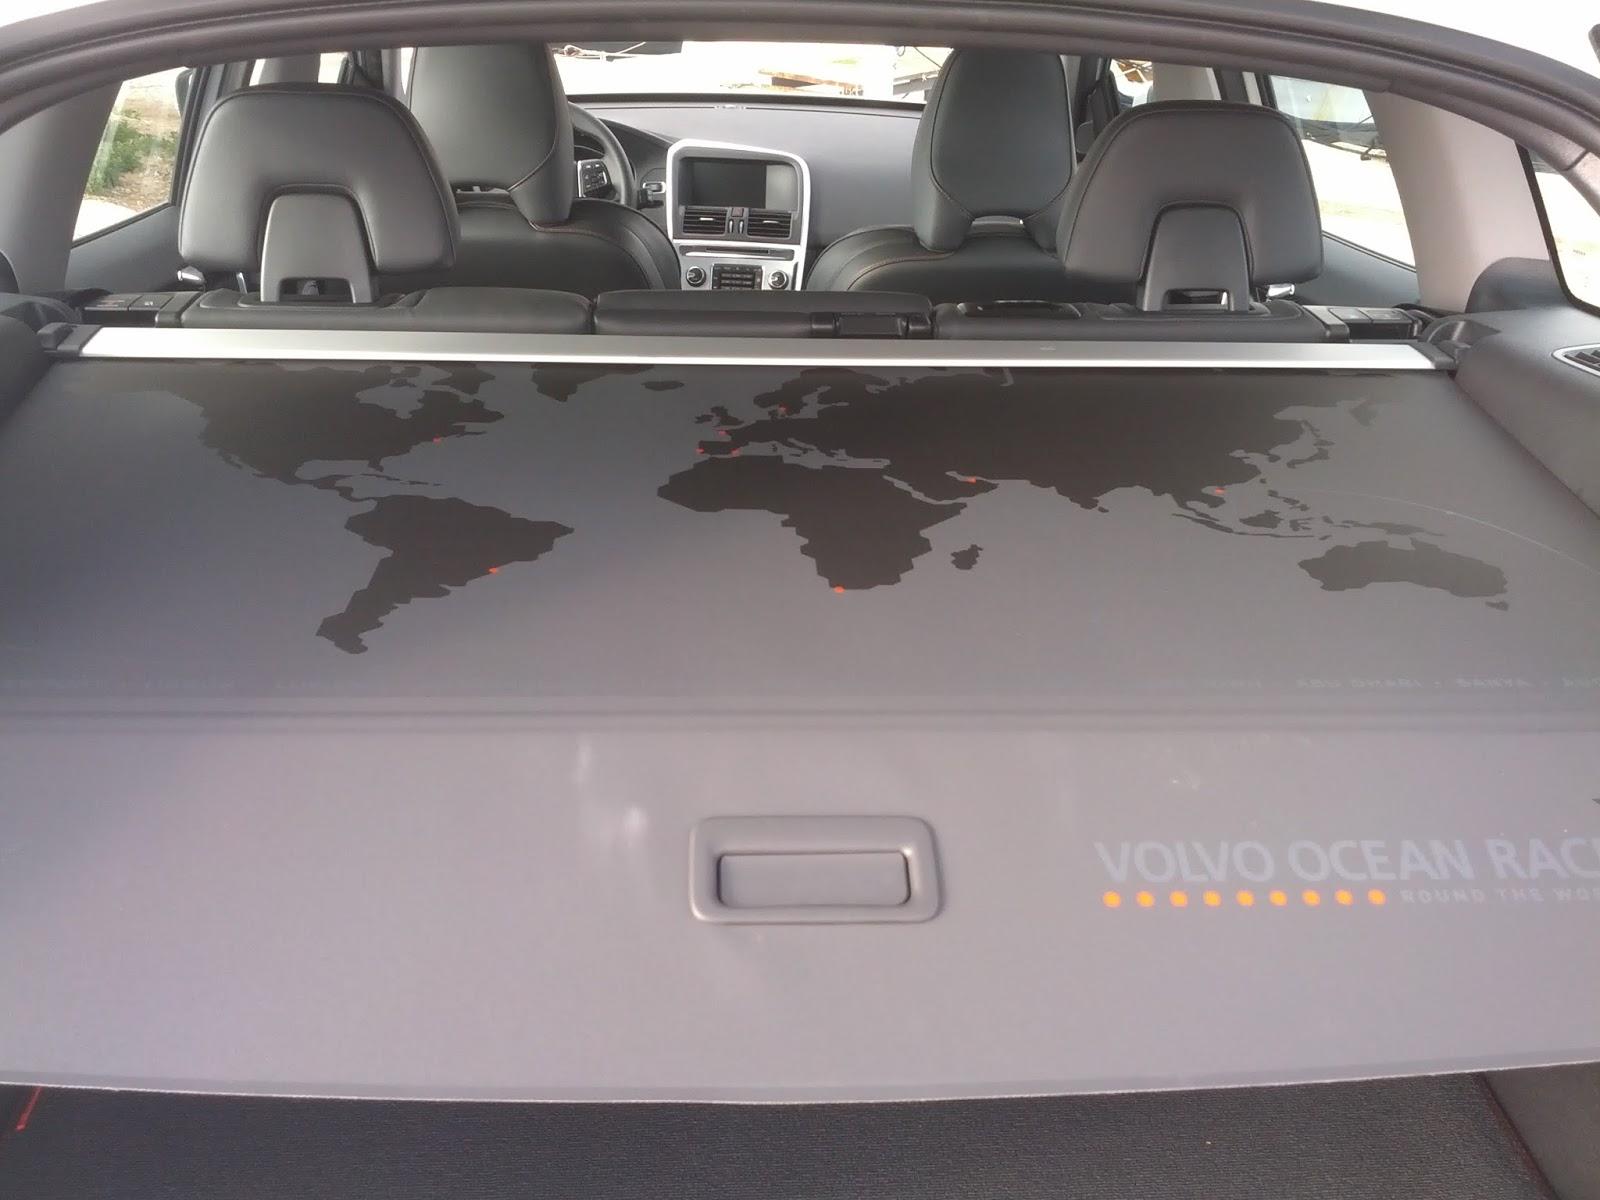 IMG 20151209 141759 Γιατί το Volvo XC60 είναι εθιστικό